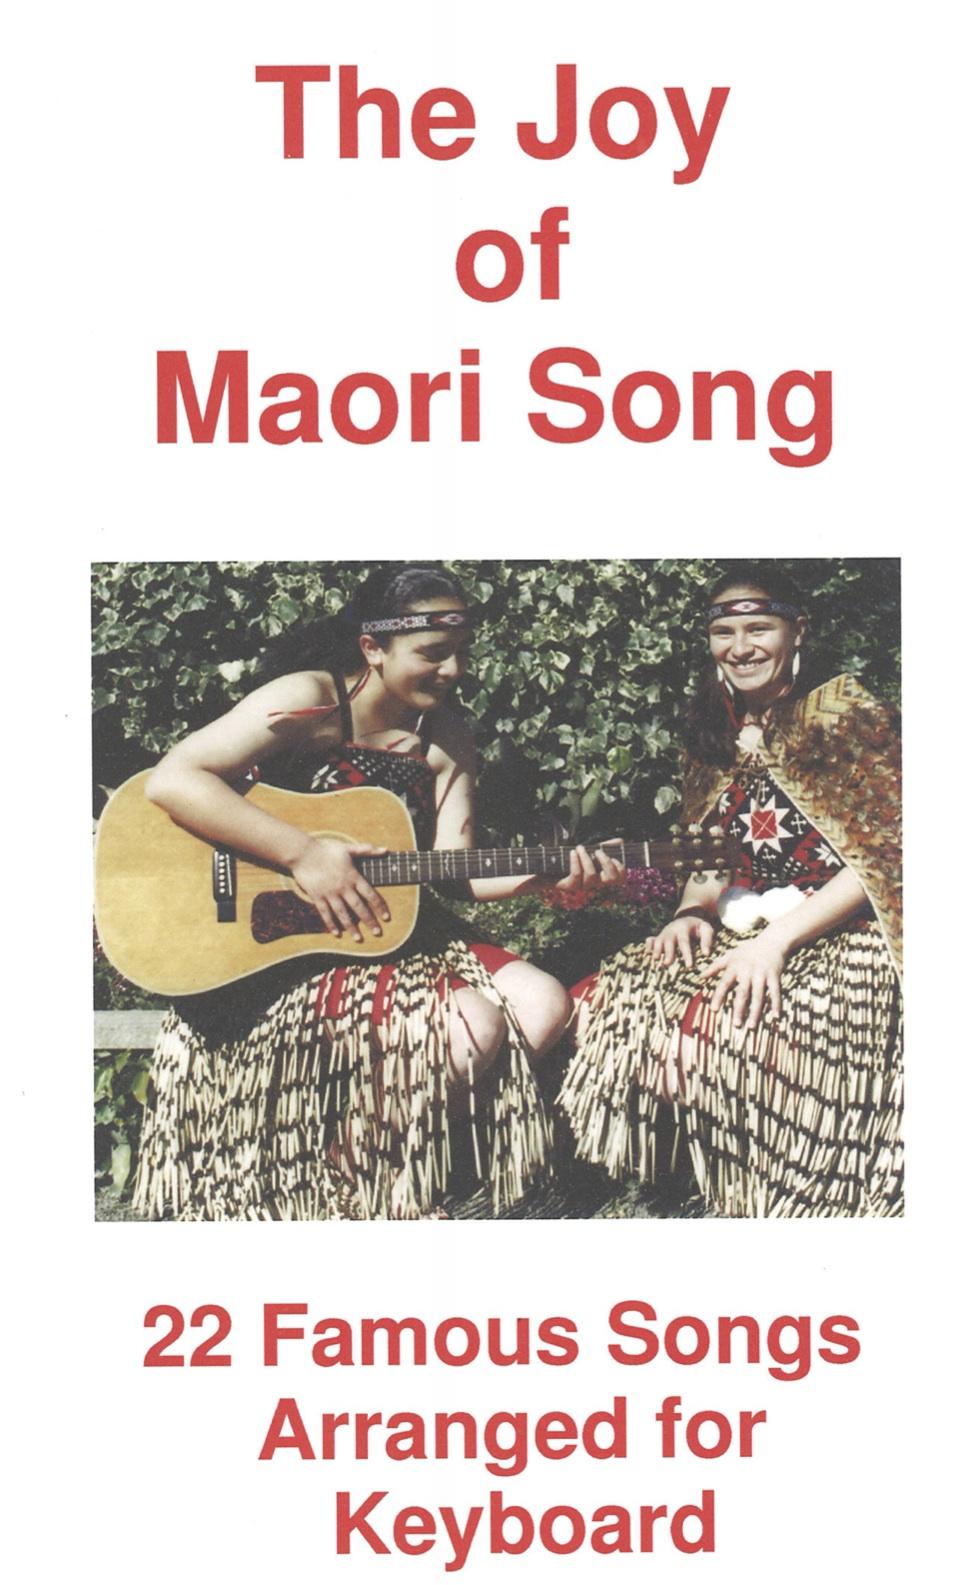 SOUNZ The Joy of Maori Song